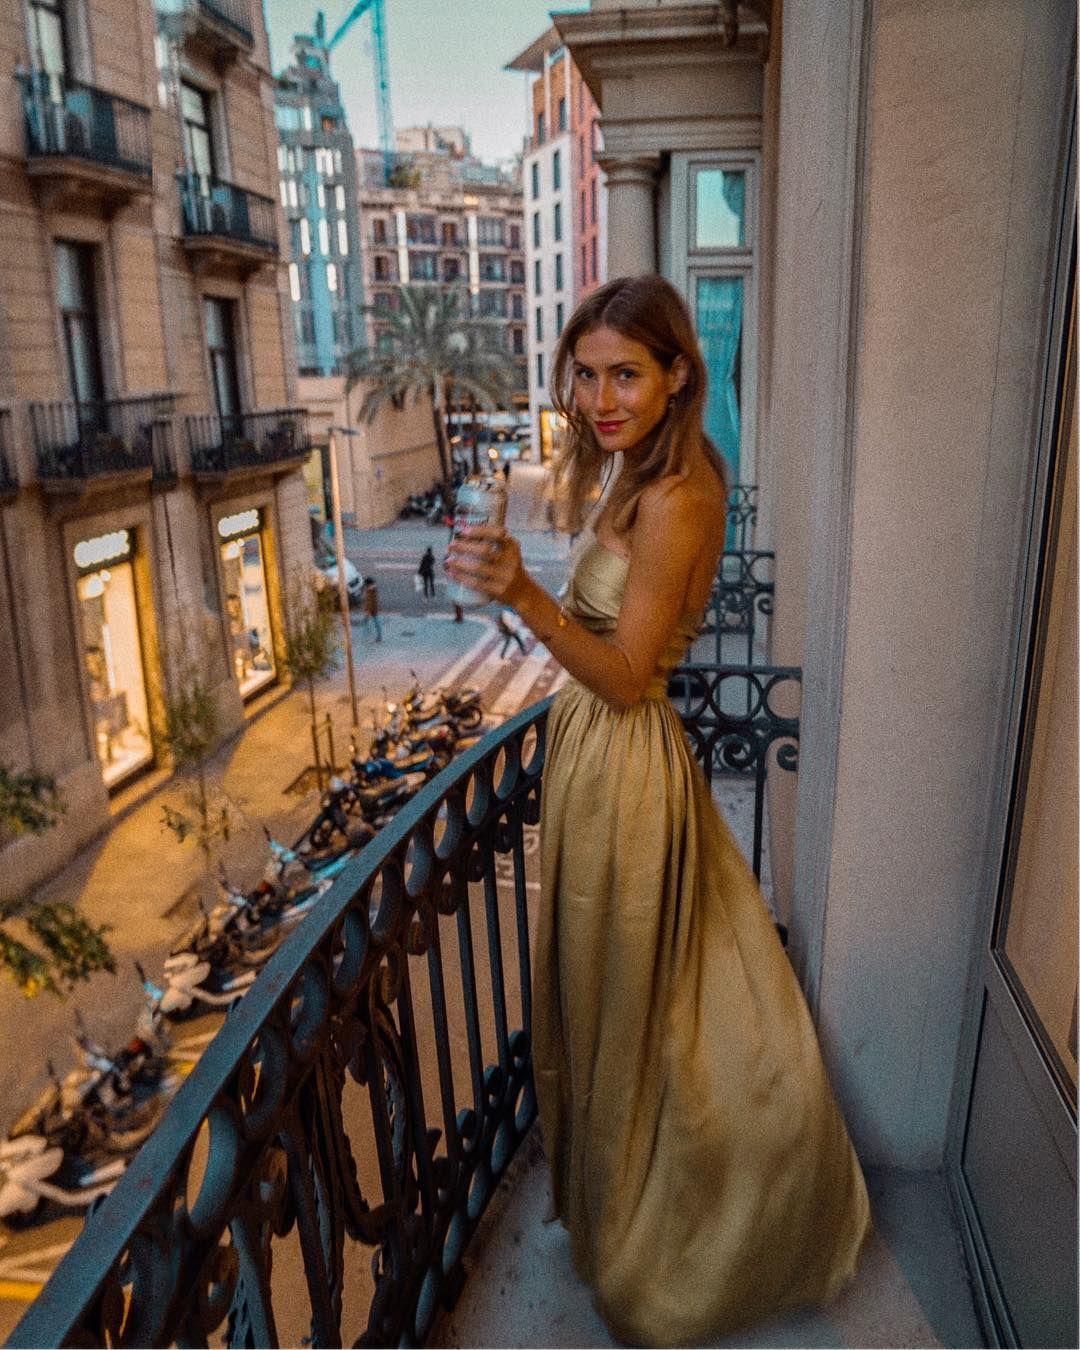 Instagram Jelena Cikoja nude photos 2019